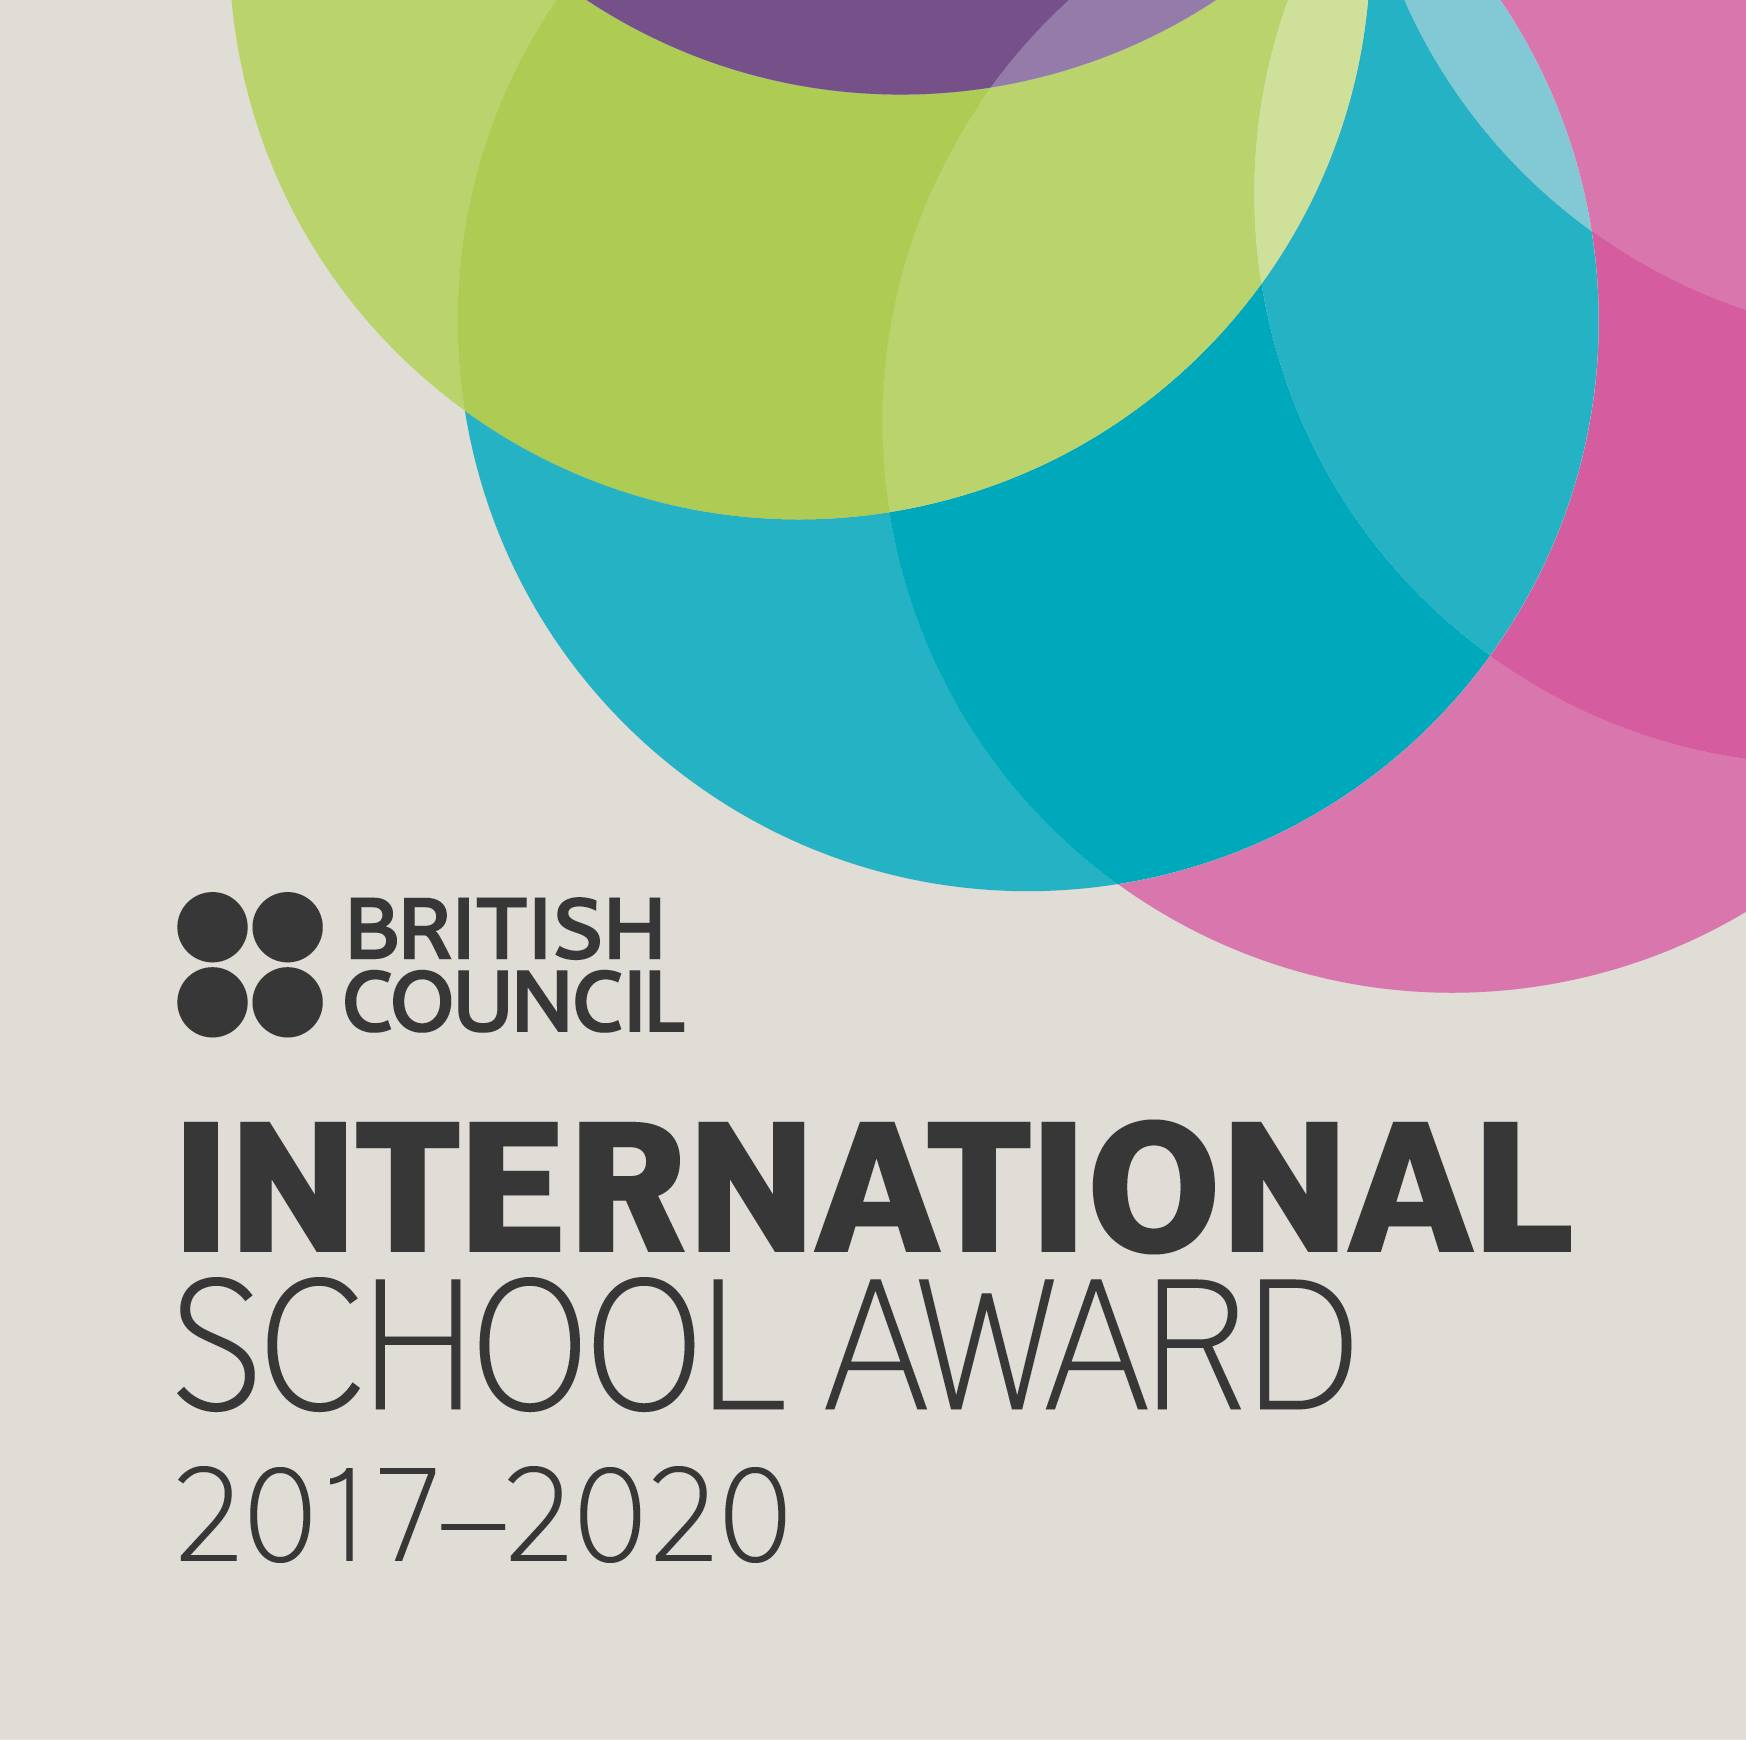 BRITISH COUNCIL INTERNATIONAL SCHOOL AWARD 2017-2020